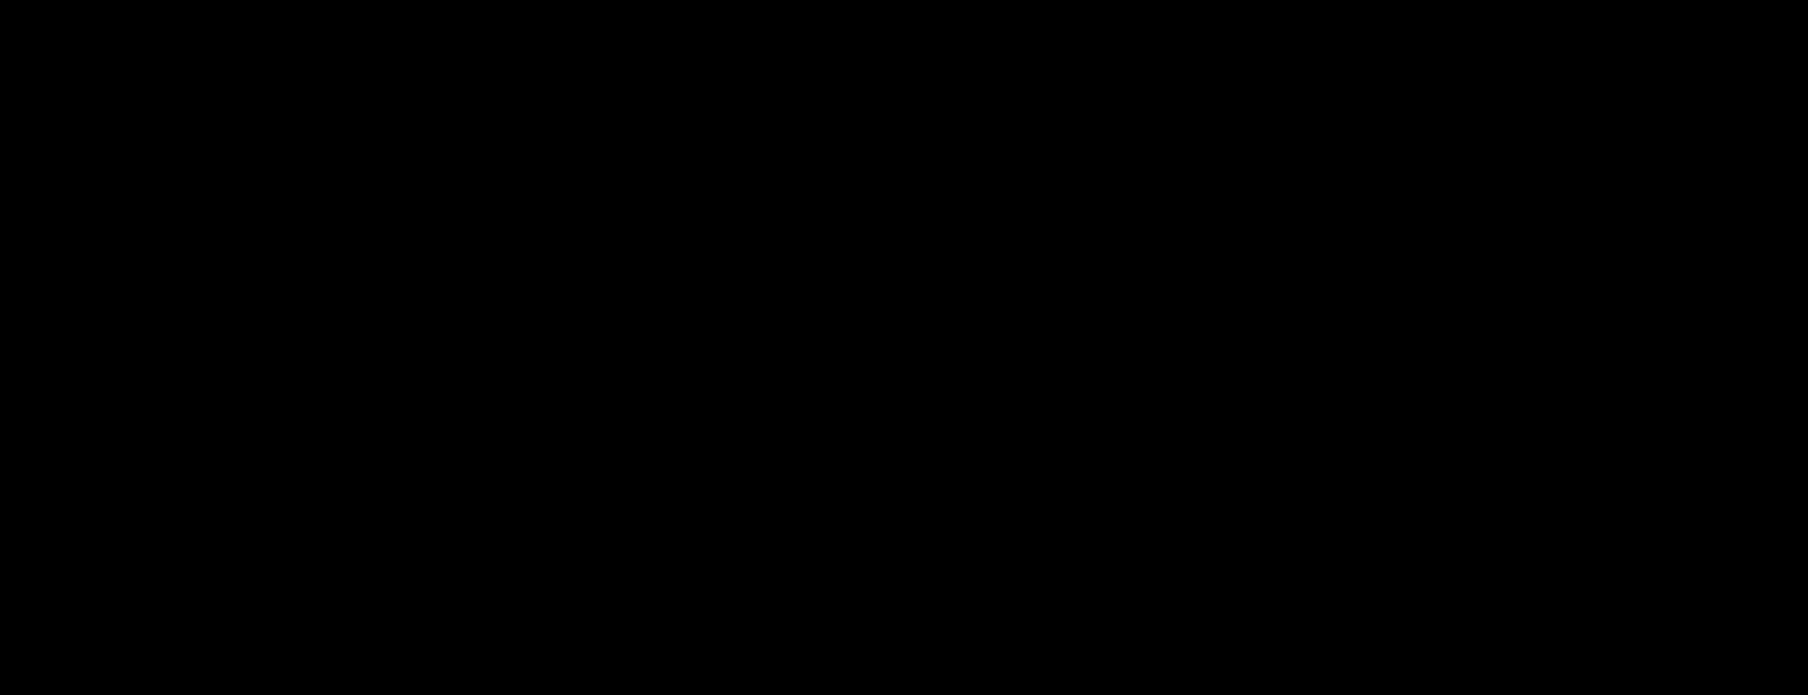 Levothyroxineethyl ester